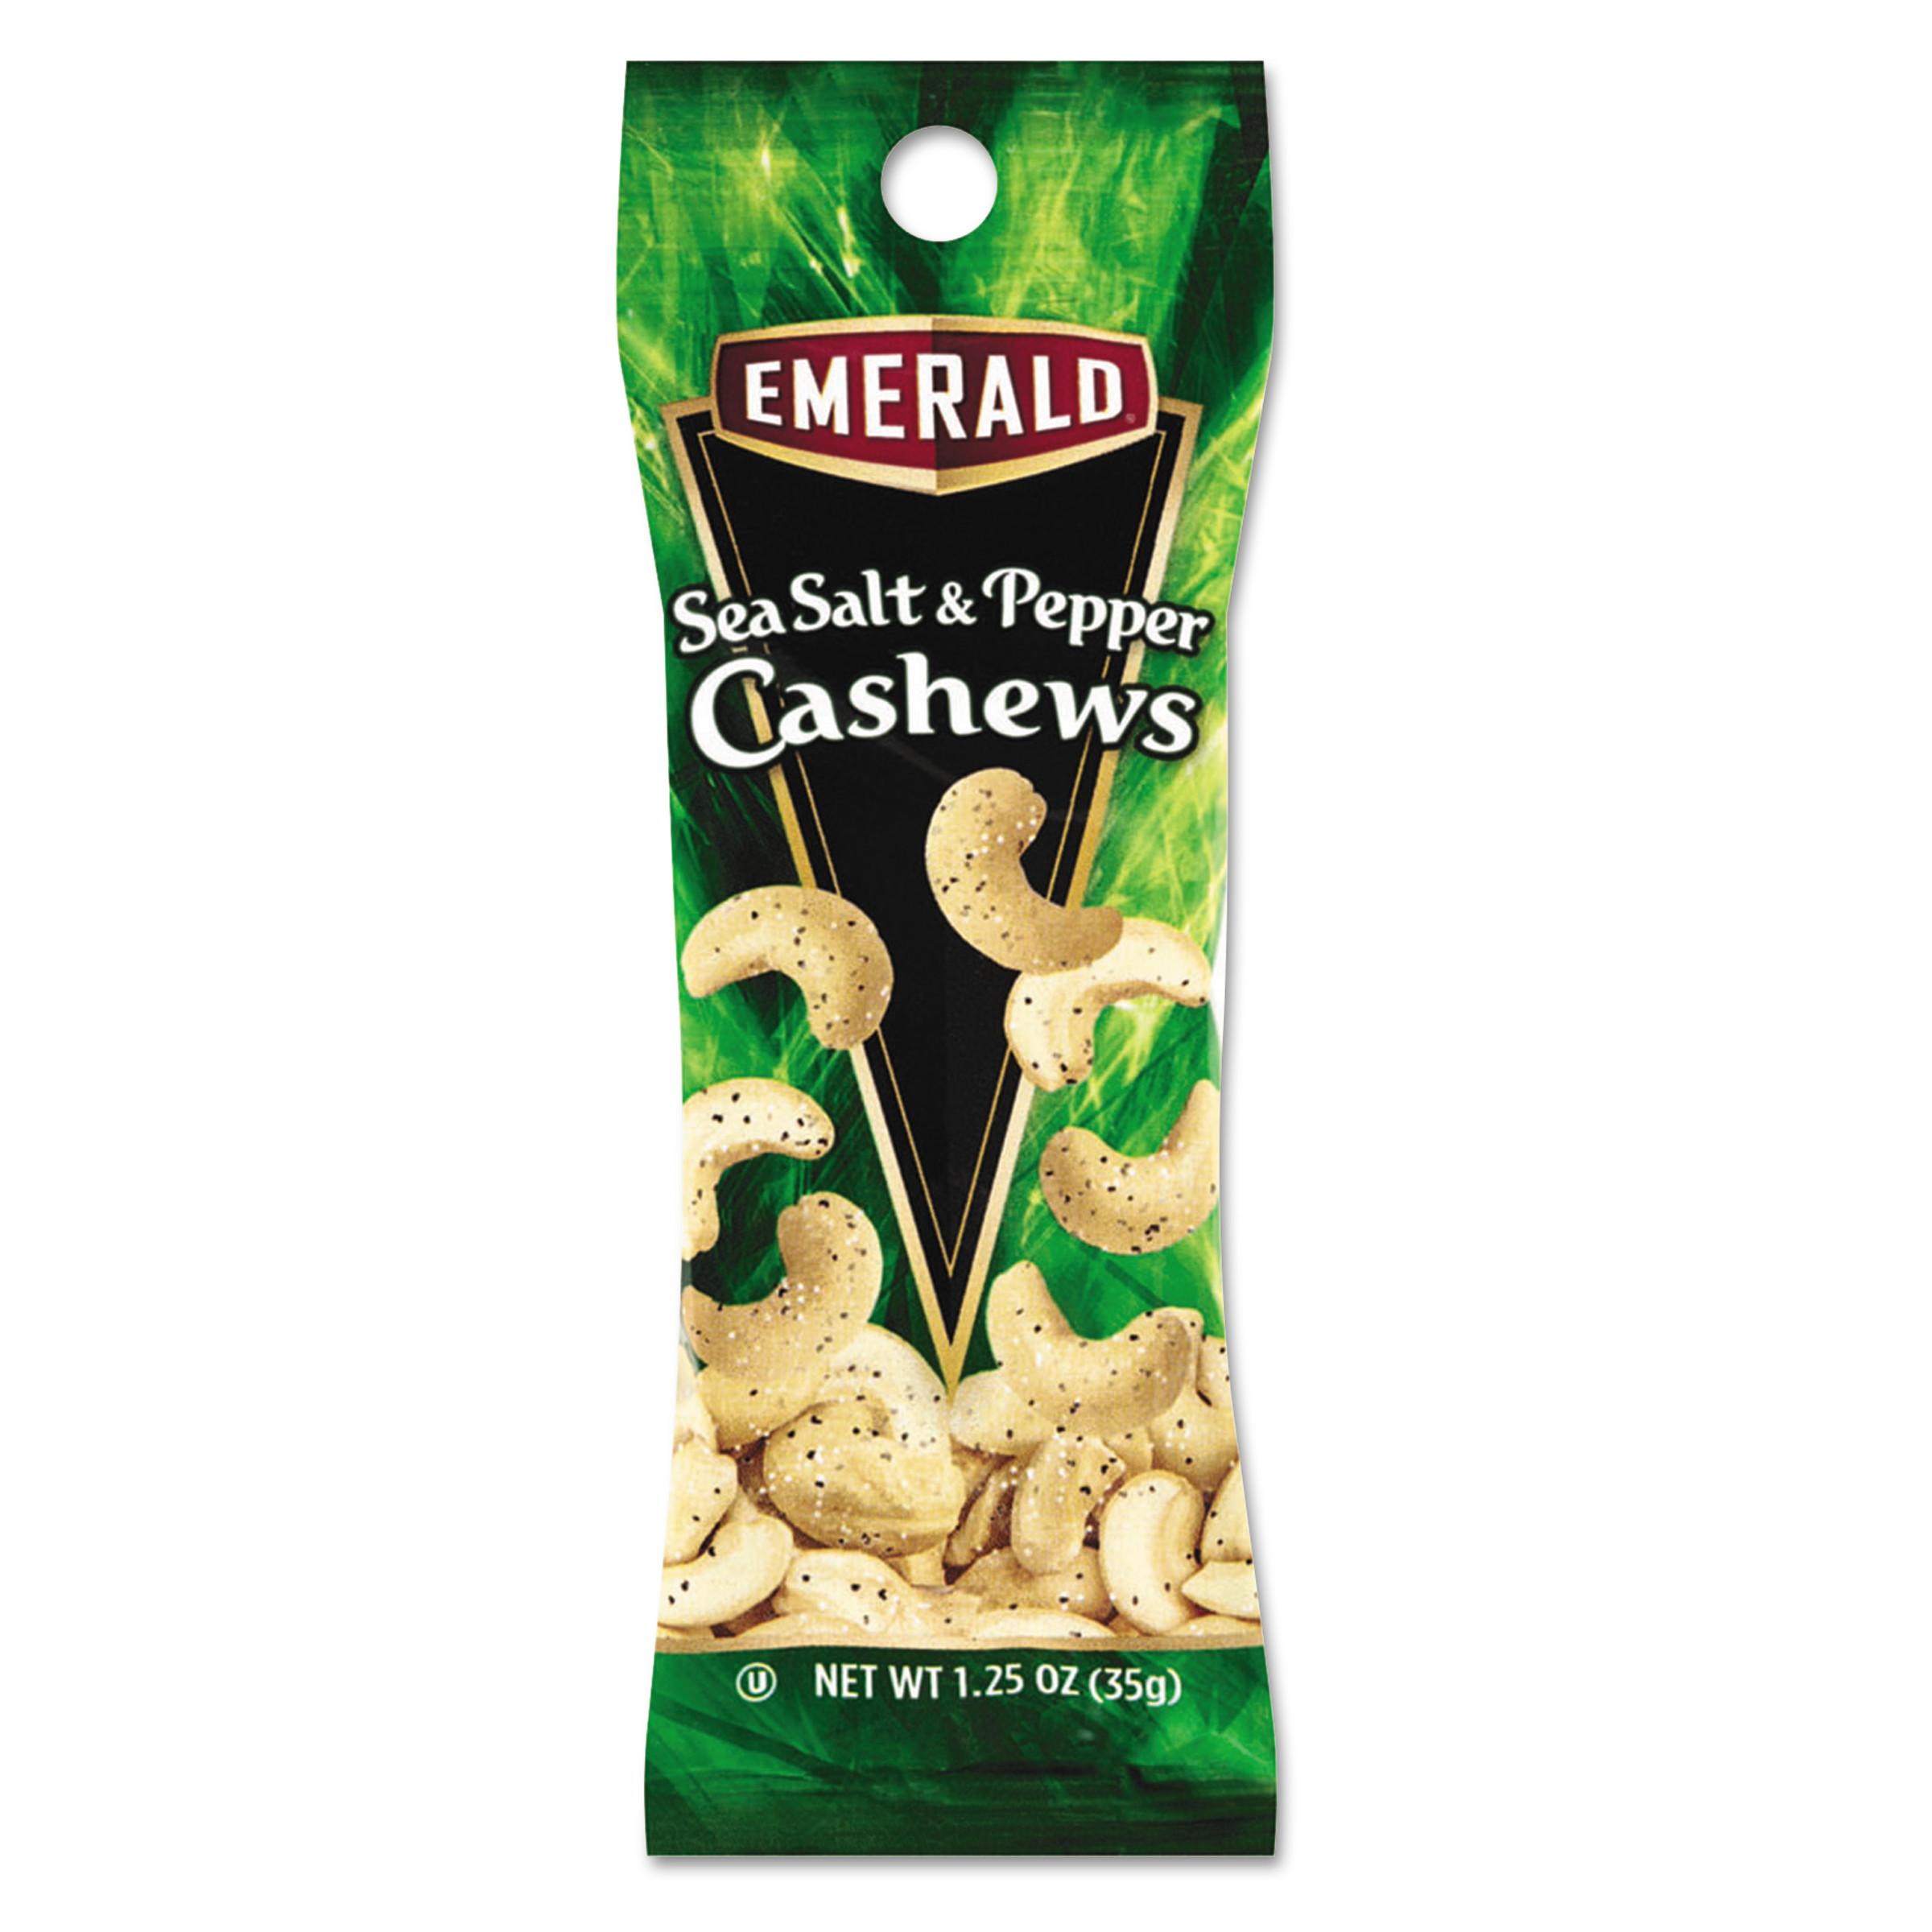 Emerald Sea Salt & Pepper Cashews, 1.25 Oz., 12 Count